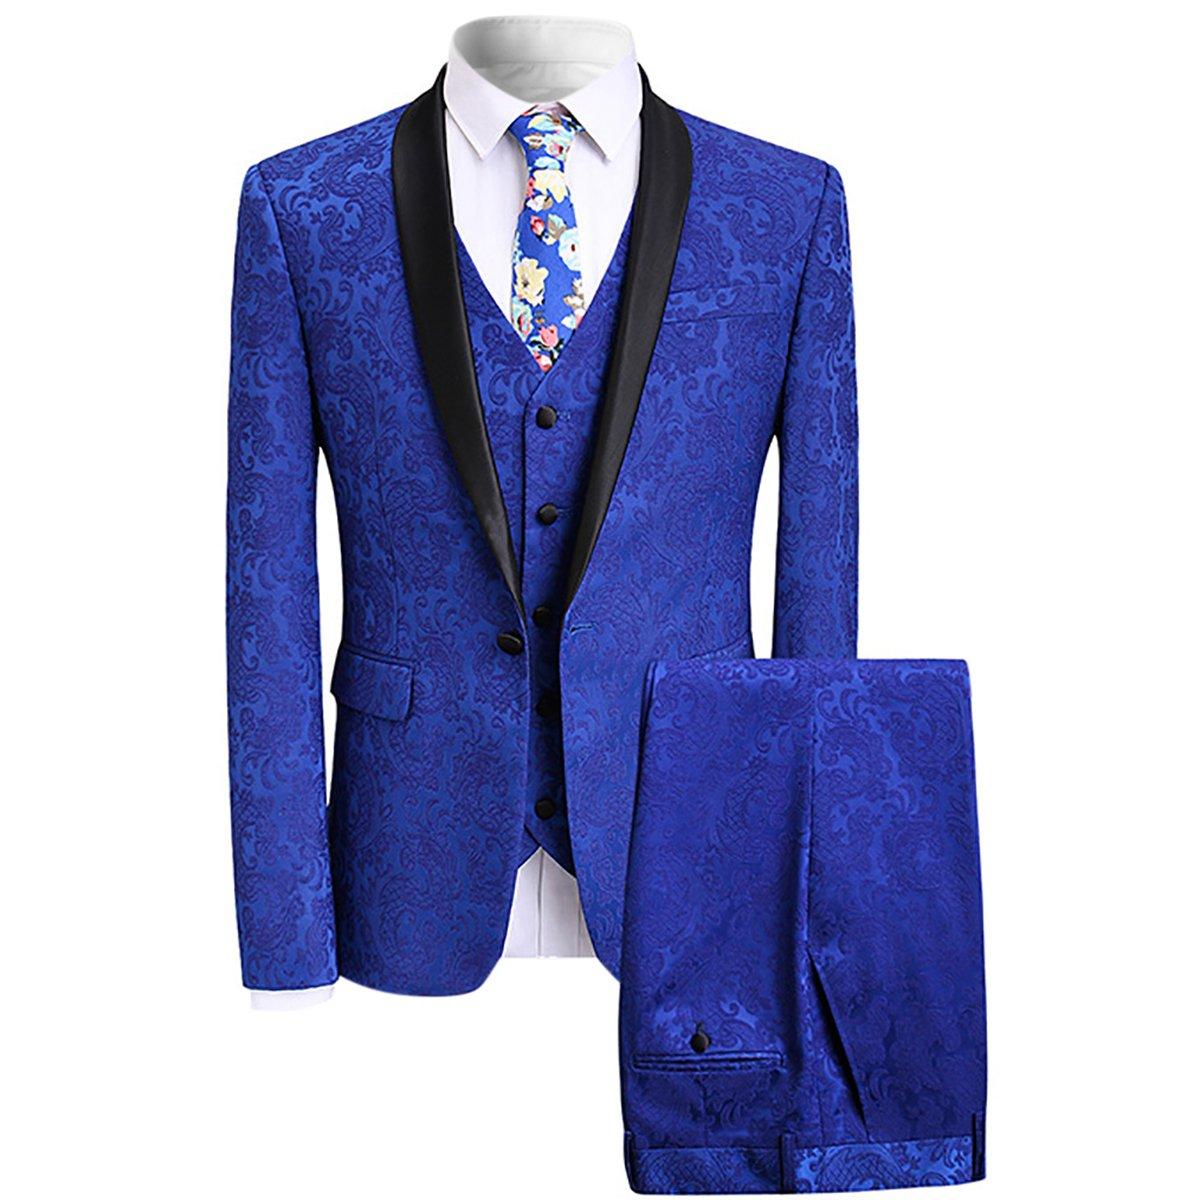 YFFUSHI Men's Elegant Jacquard 3 Piece Suit Slim Fit Royal Blue Tuxedo XF6047